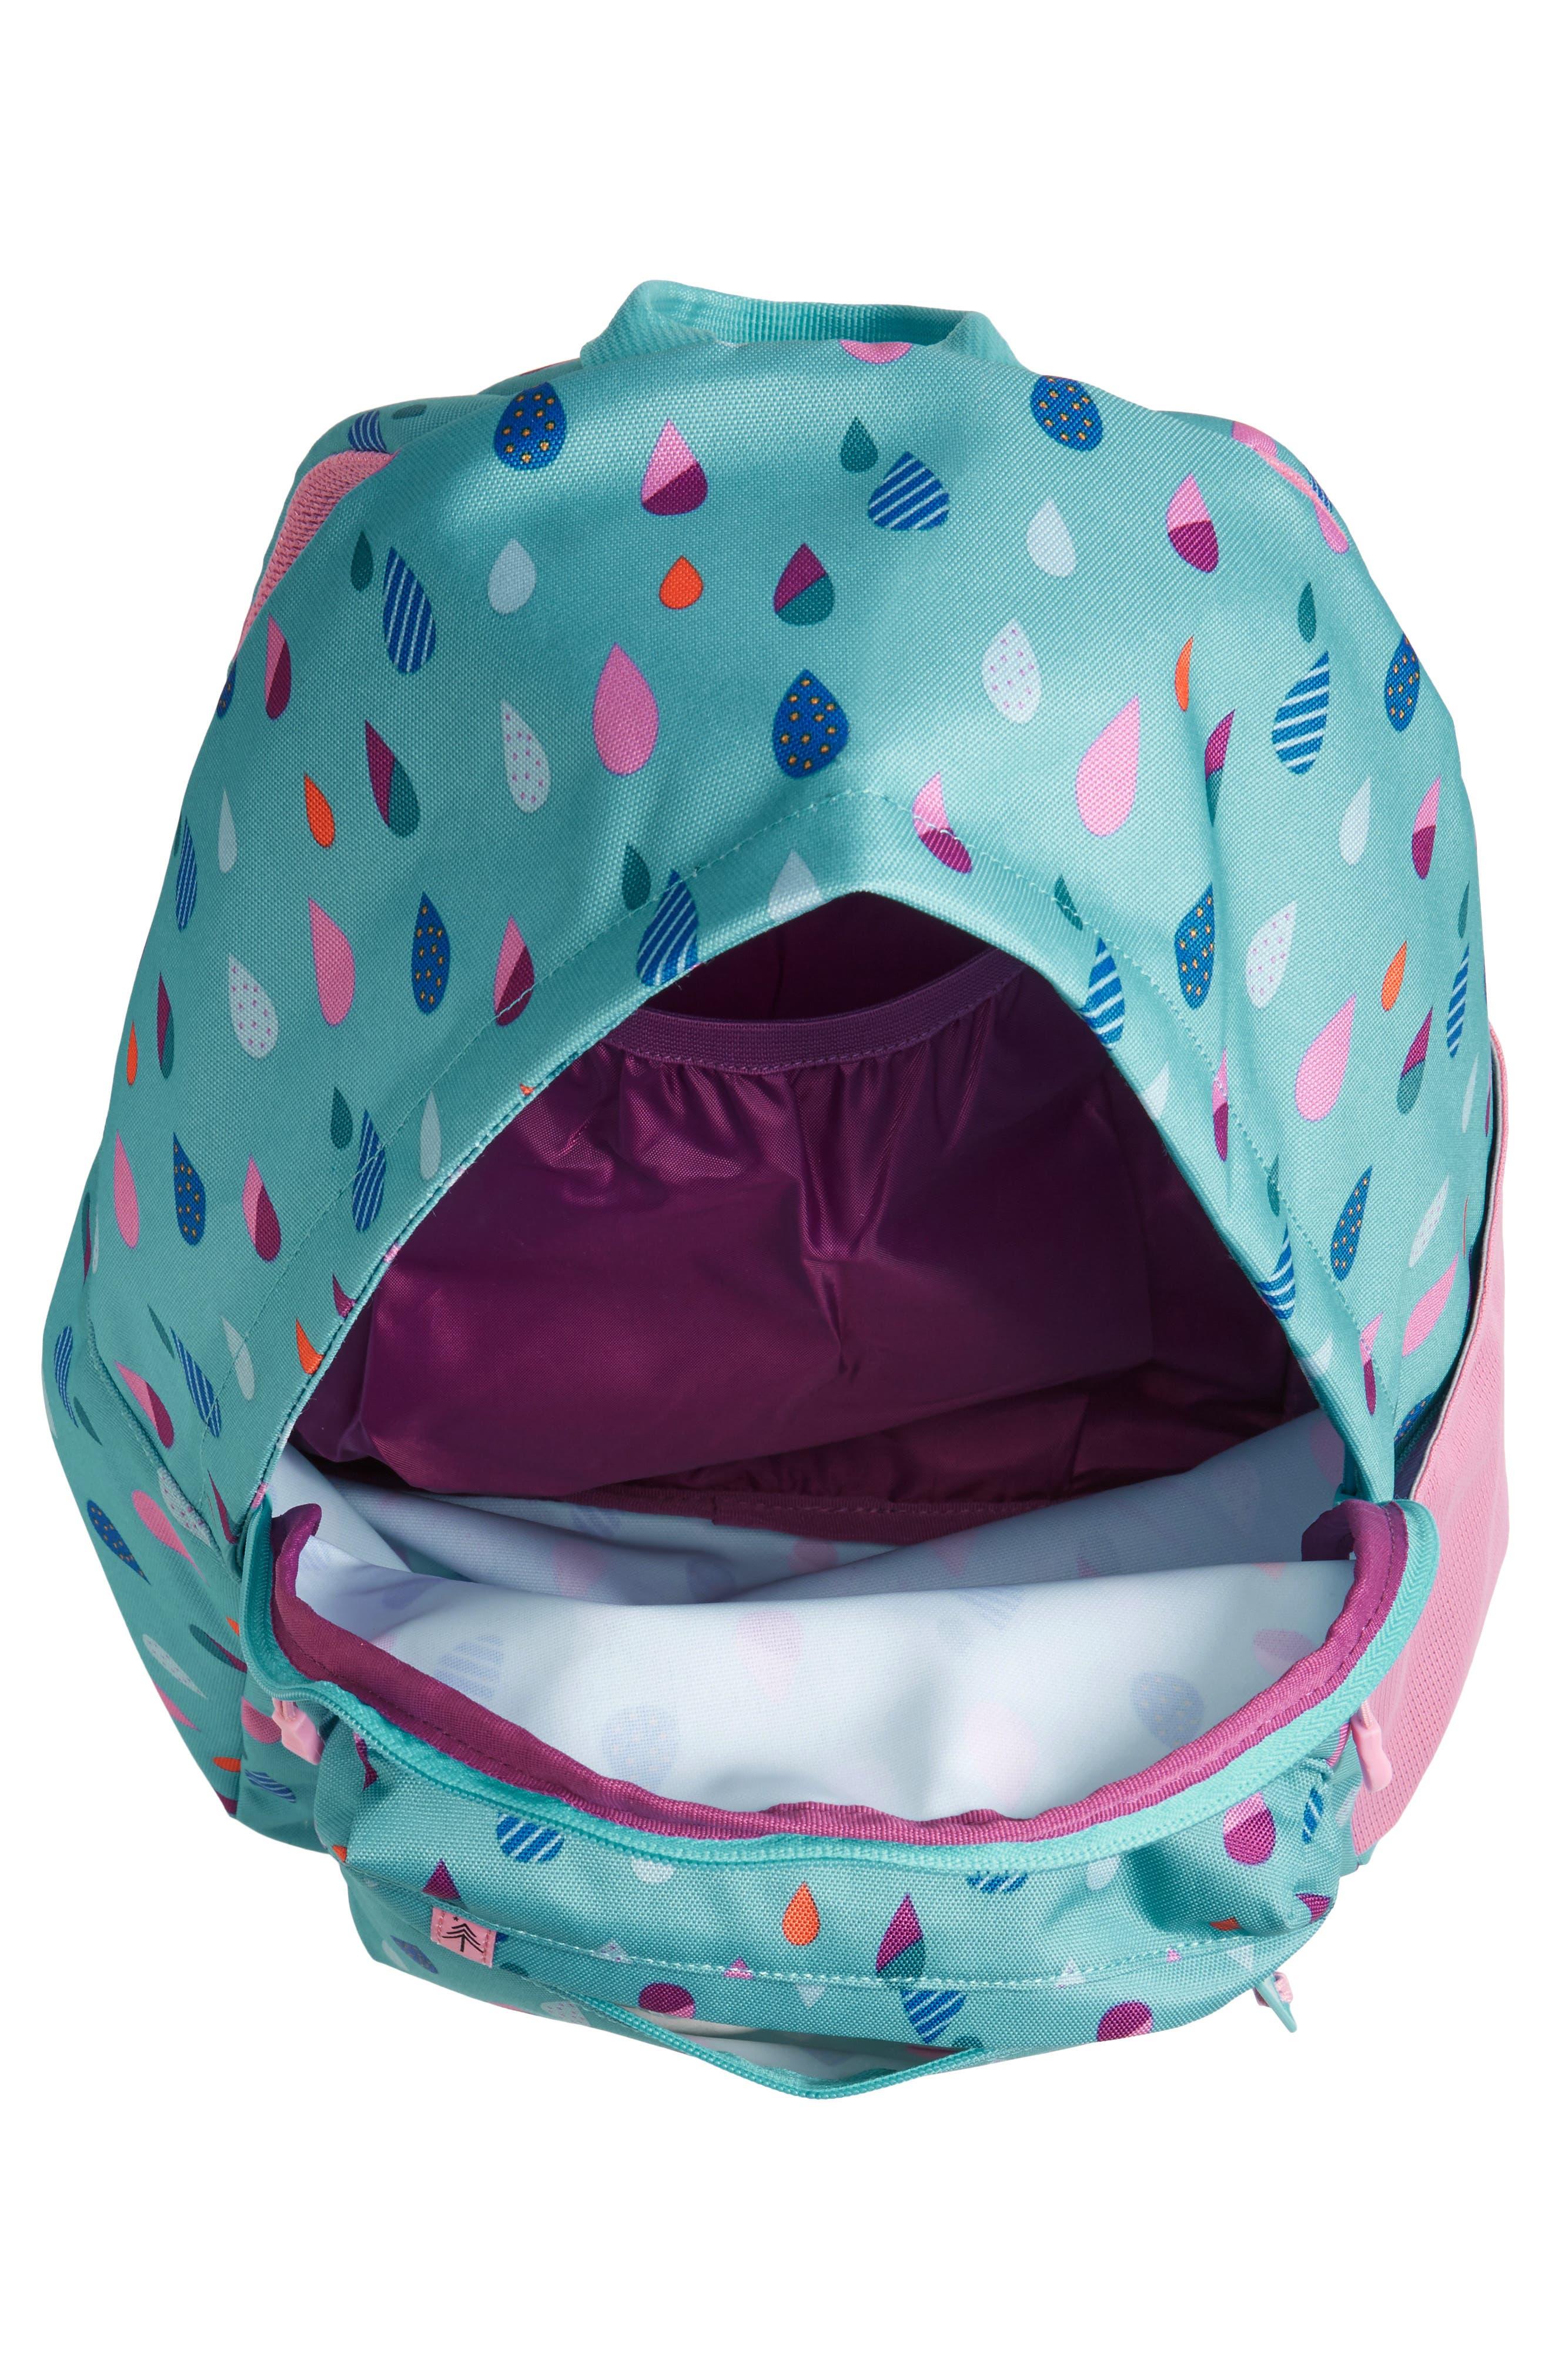 Bayside - Puddles Backpack,                             Alternate thumbnail 4, color,                             Blue